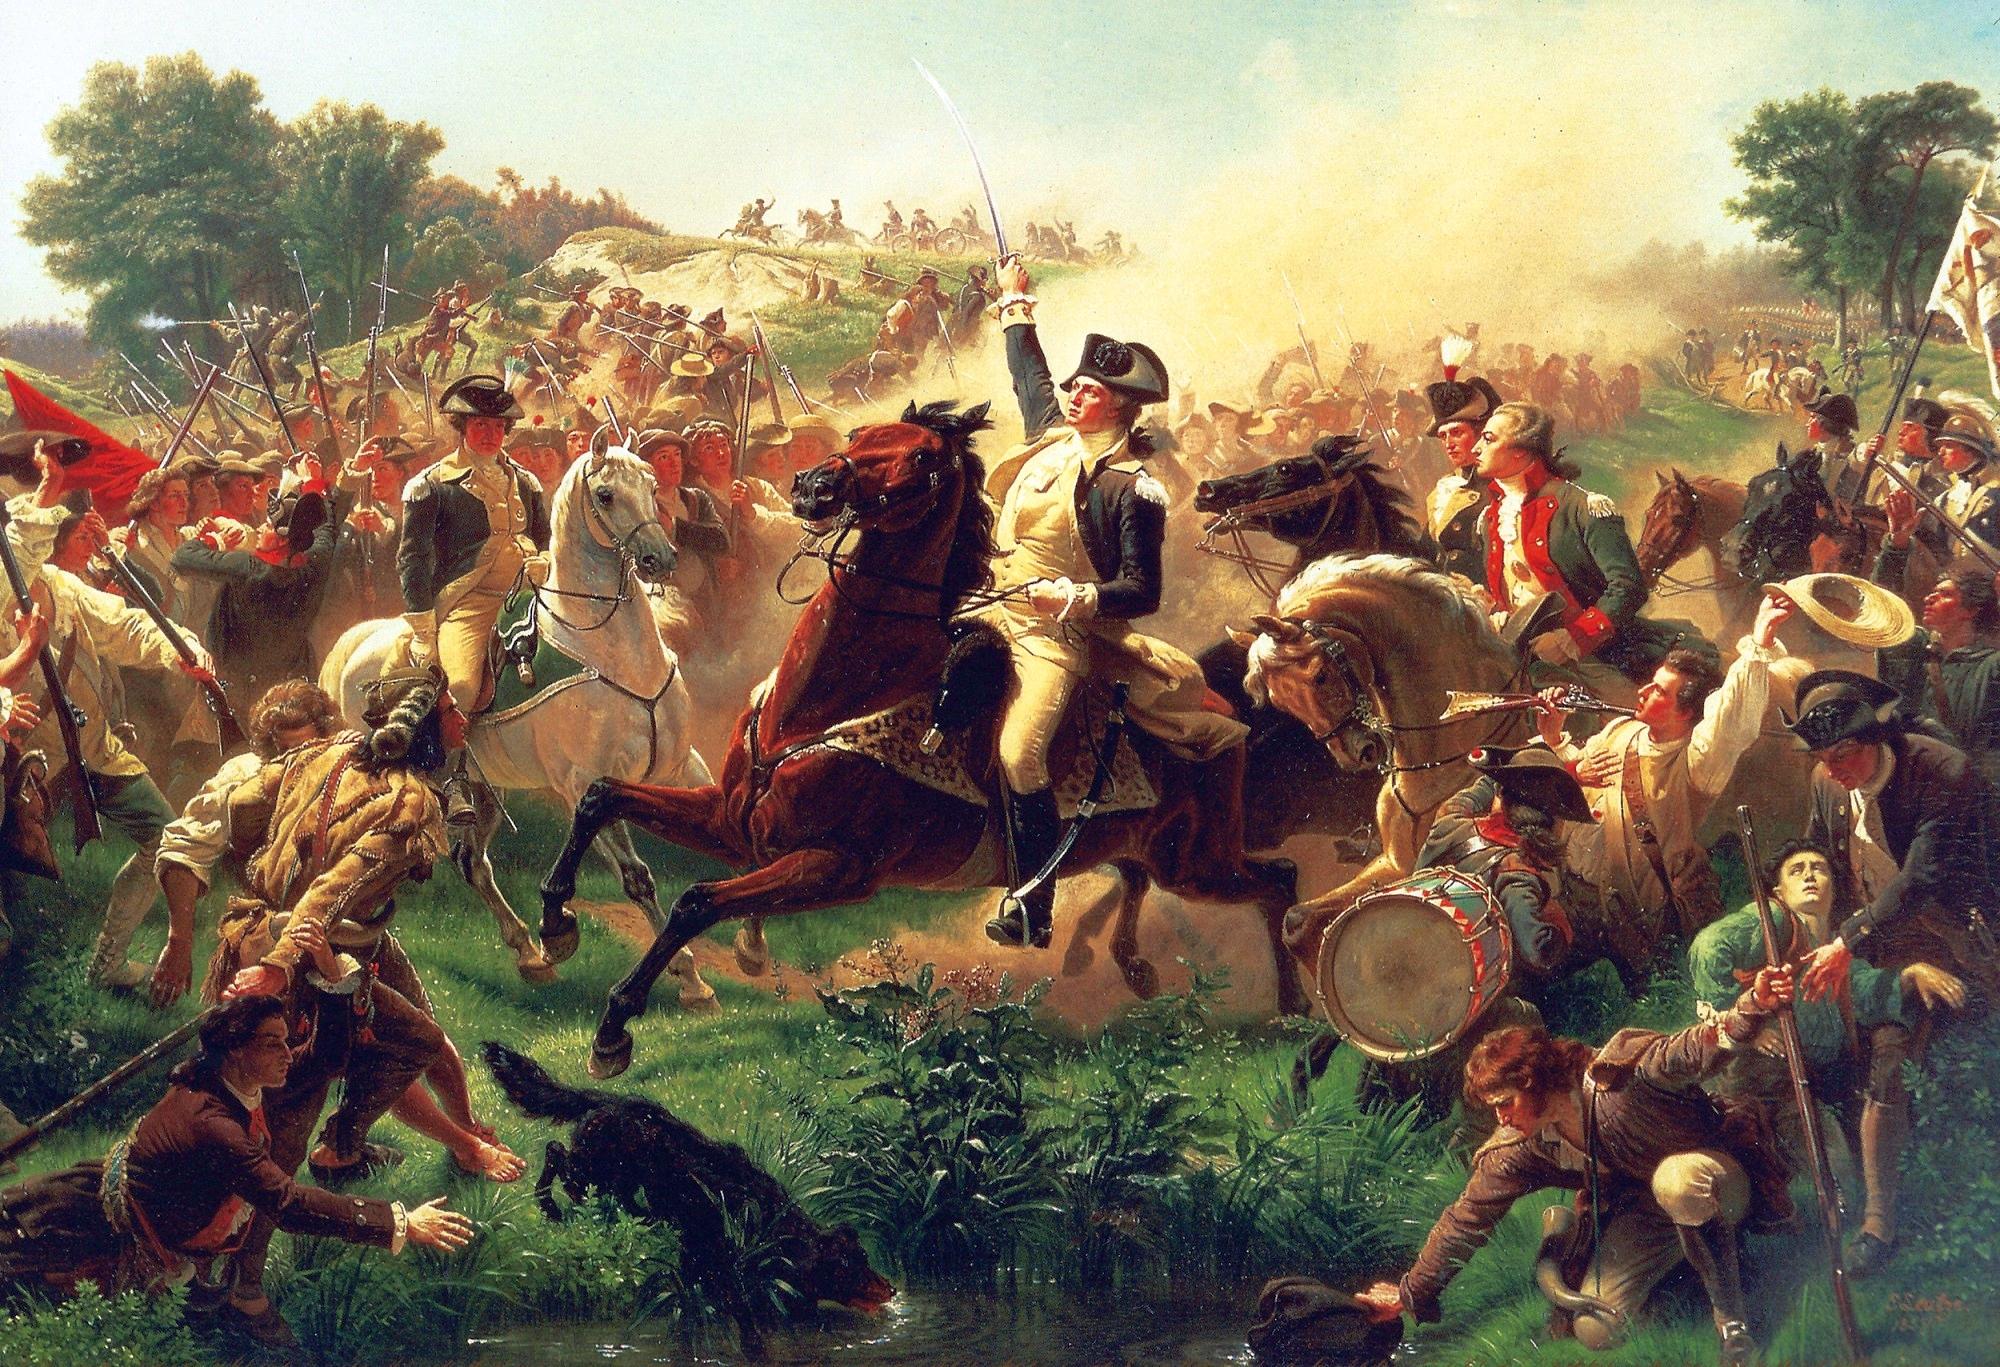 https://i0.wp.com/upload.wikimedia.org/wikipedia/commons/9/9f/BattleofMonmouth.jpg